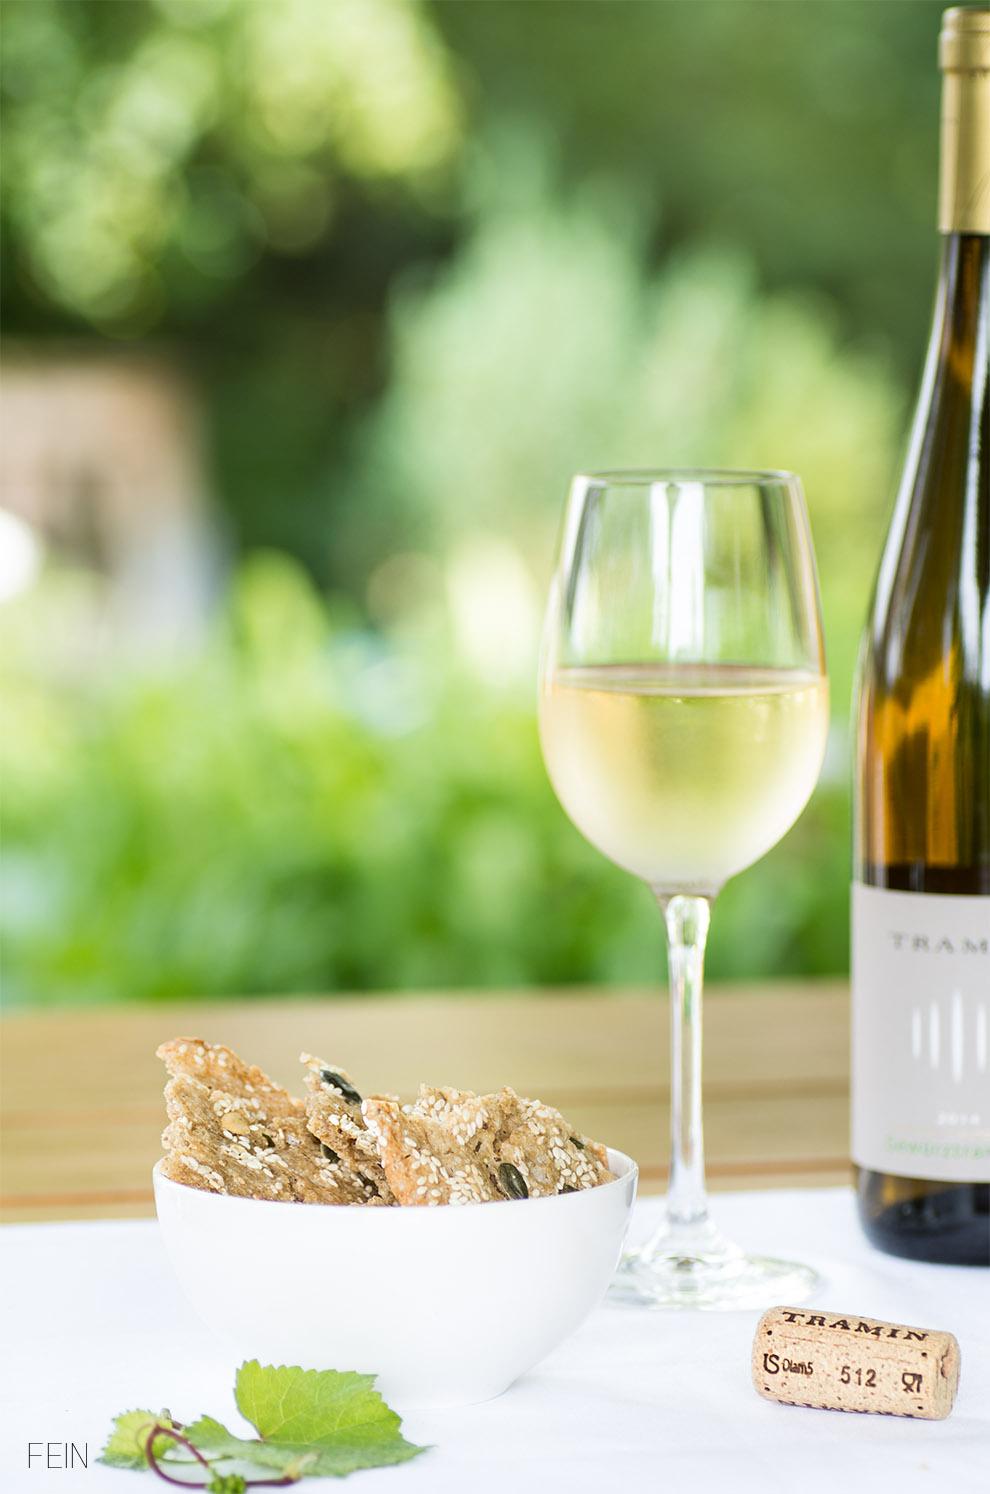 Wein Weinhaus Schüttelbrot